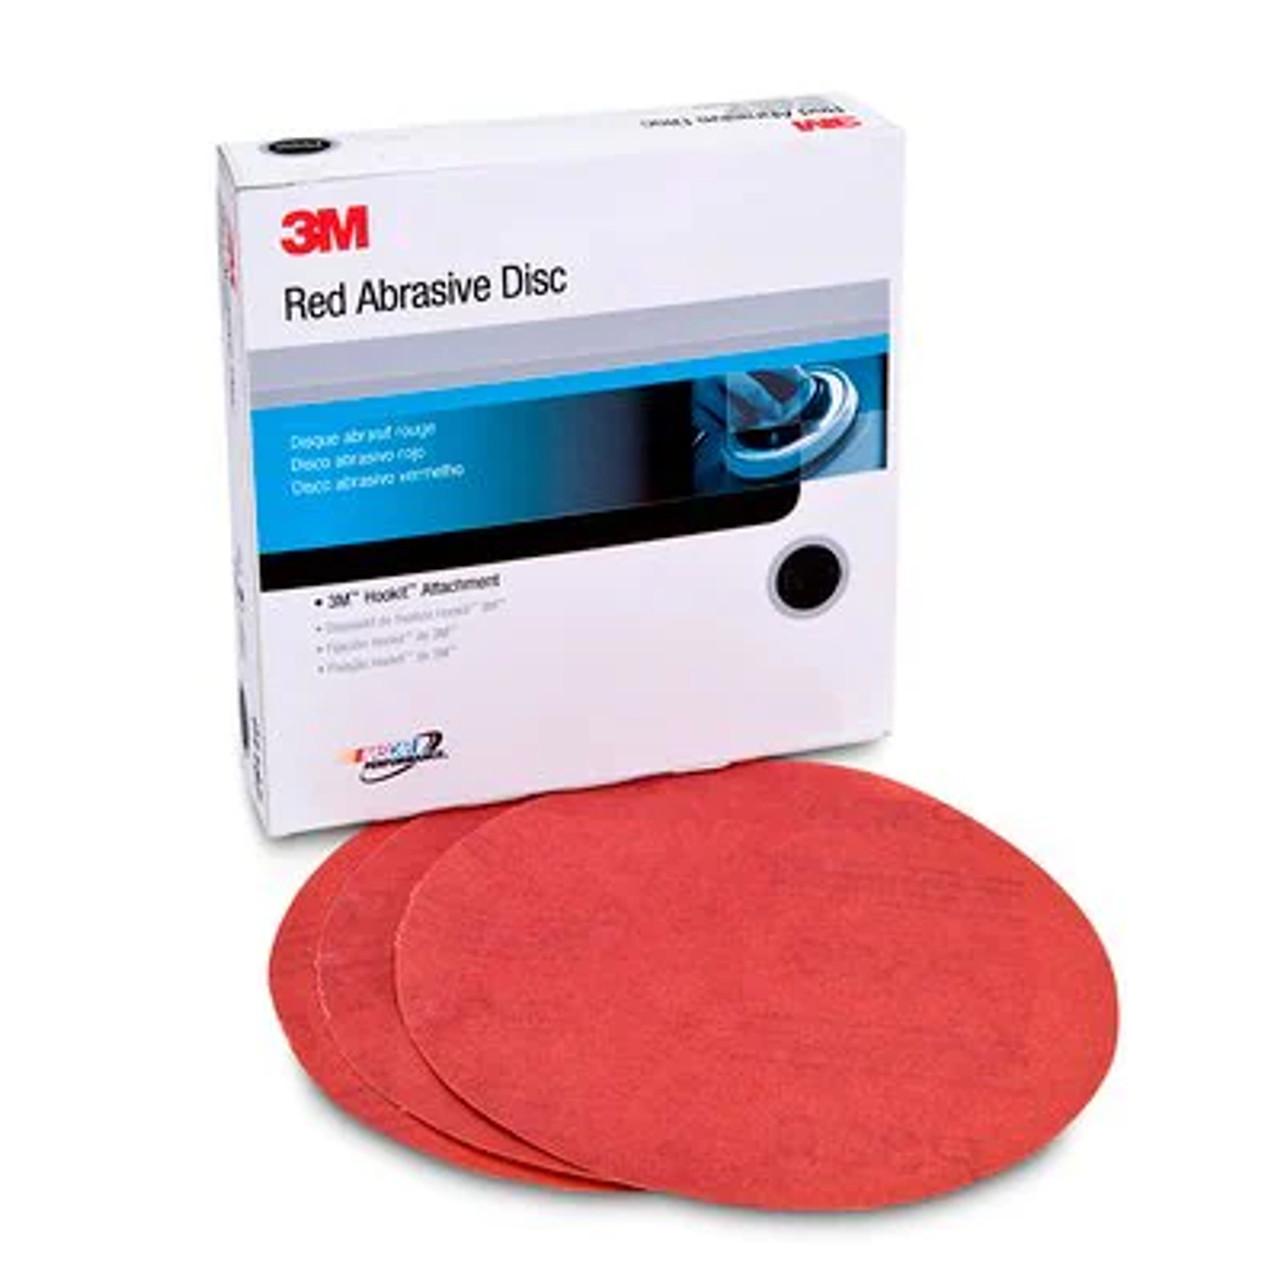 3M™ Hookit™ Red Abrasive Disc, 01223, 6 in, P150